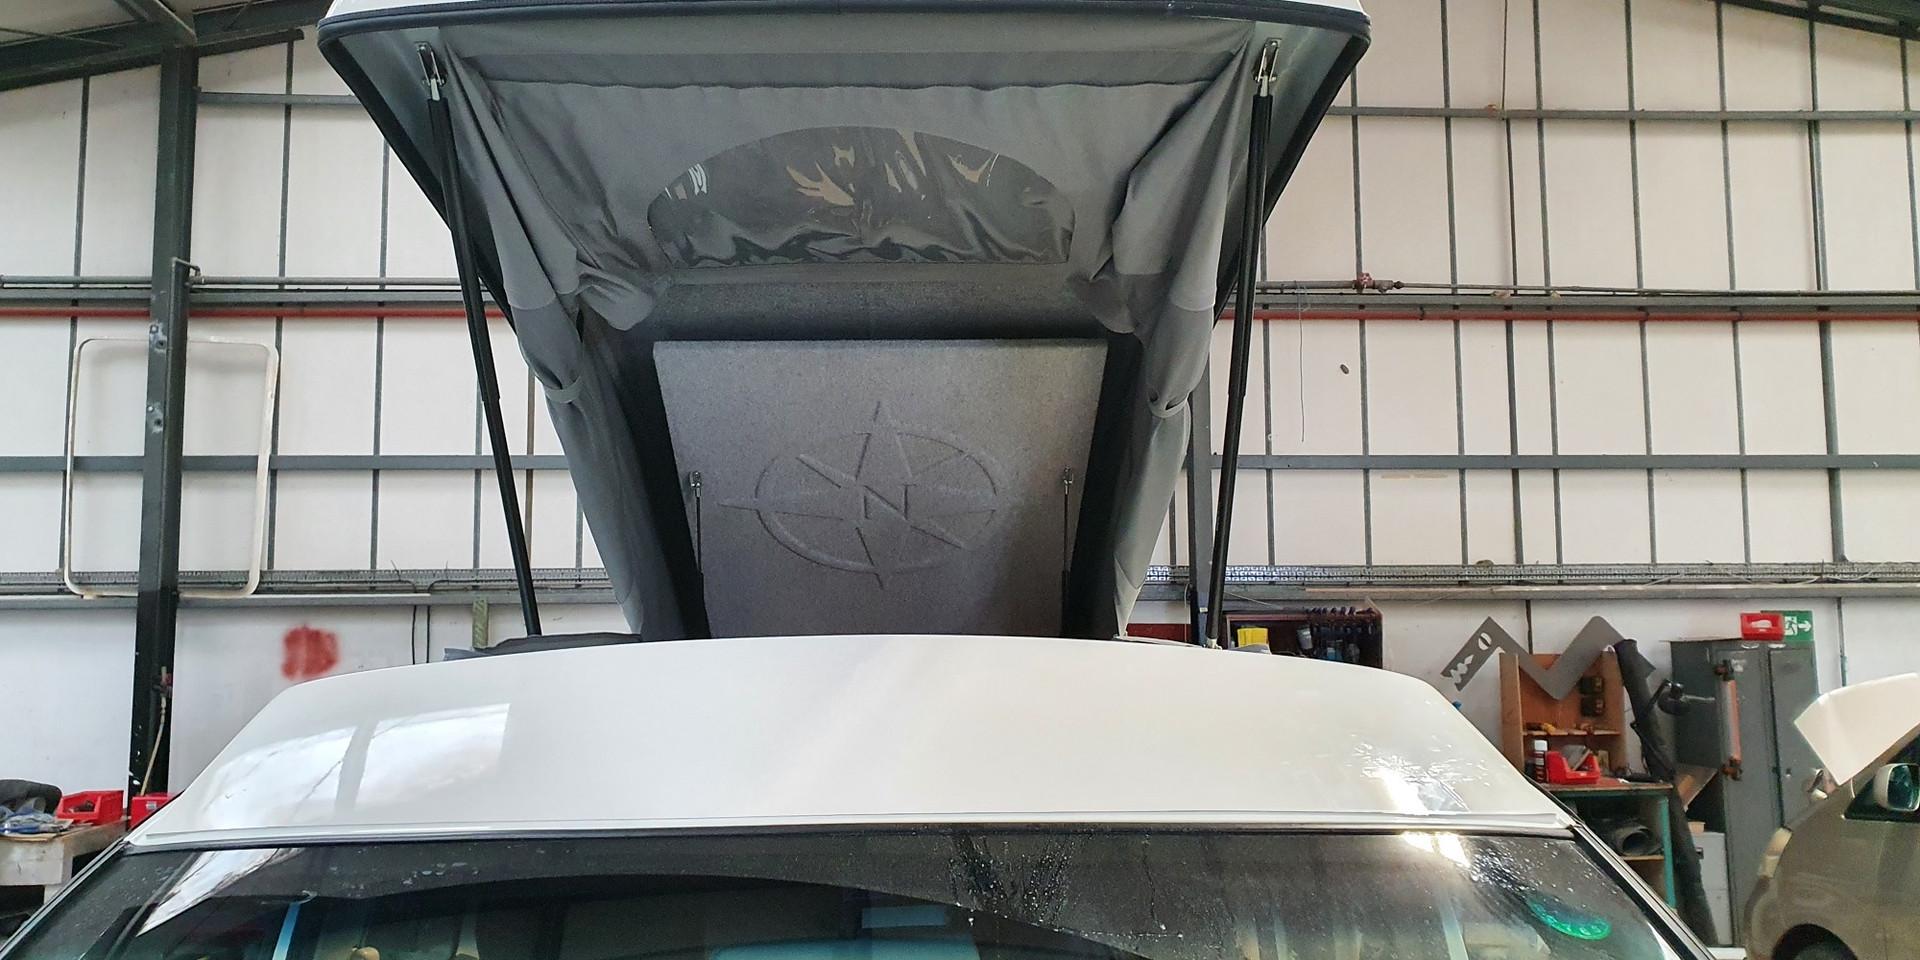 Nissan Elgrand - Elevating Roof - Norths